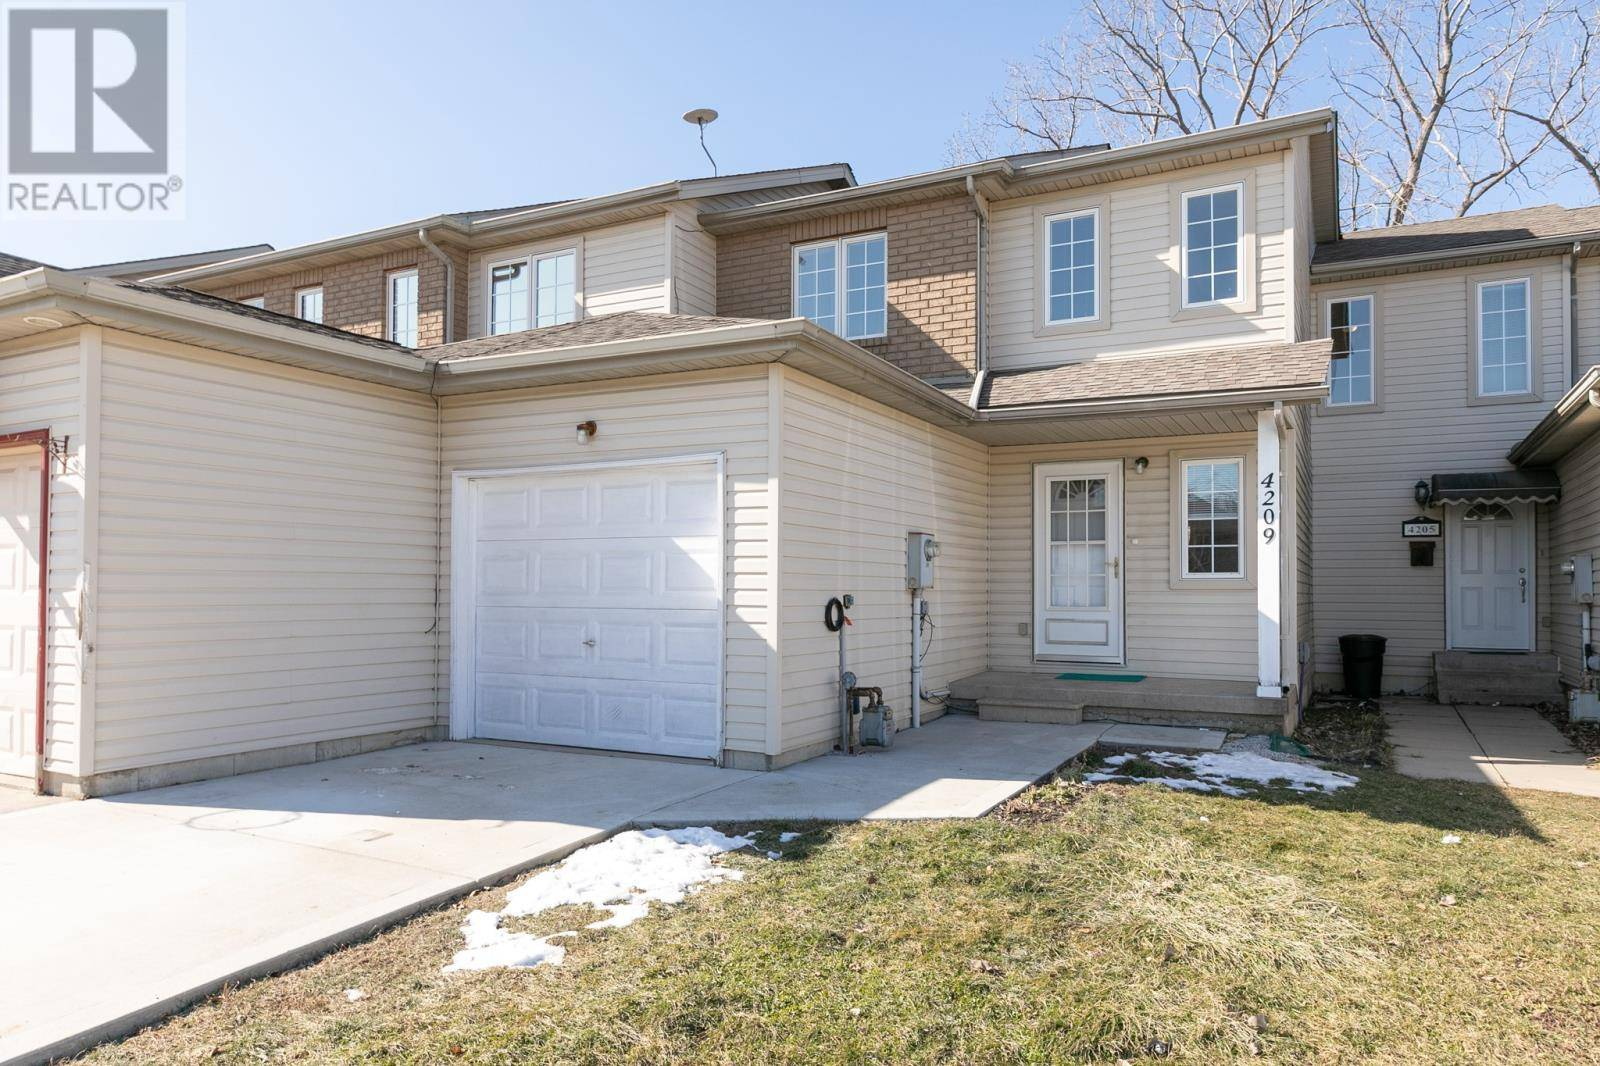 House for sale at 4209 Pioneer  Windsor Ontario - MLS: 20002011